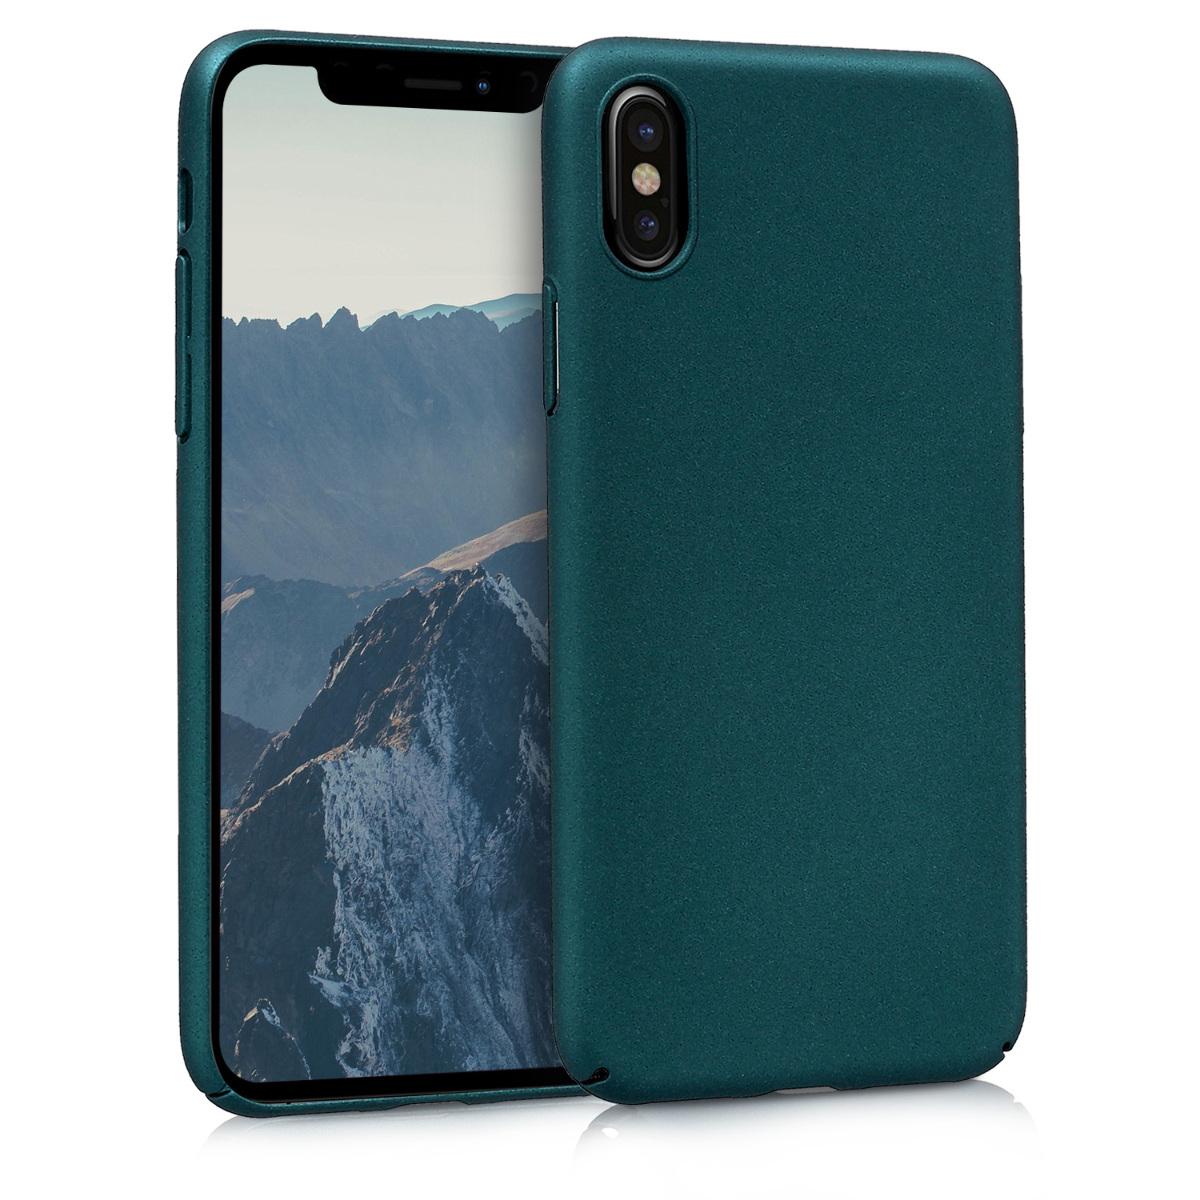 KW Slim Anti-Slip Cover - Σκληρή Θήκη Καουτσούκ iPhone X / Xs - Τυρκουάζ μεταλλικό (44596.14)